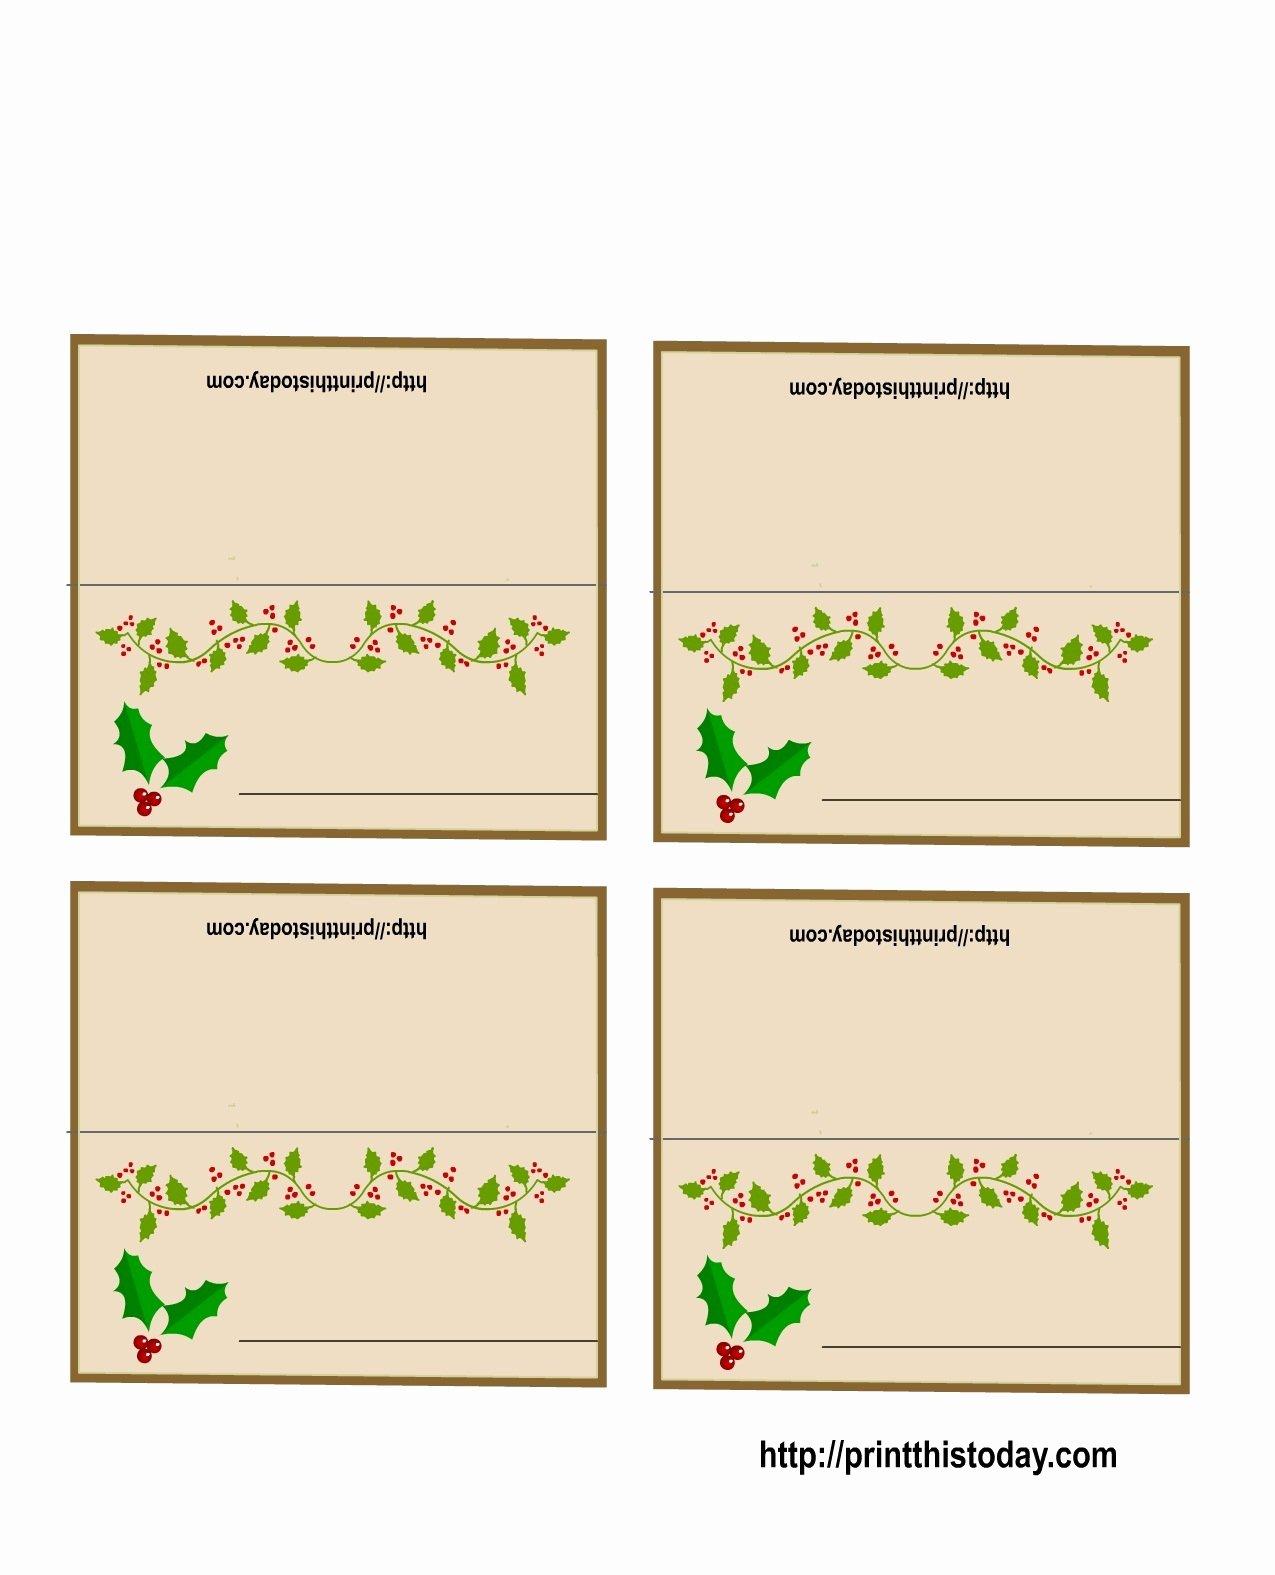 Free Printable Name Cards Elegant 19 Elegant & Fun Printable Place Cards